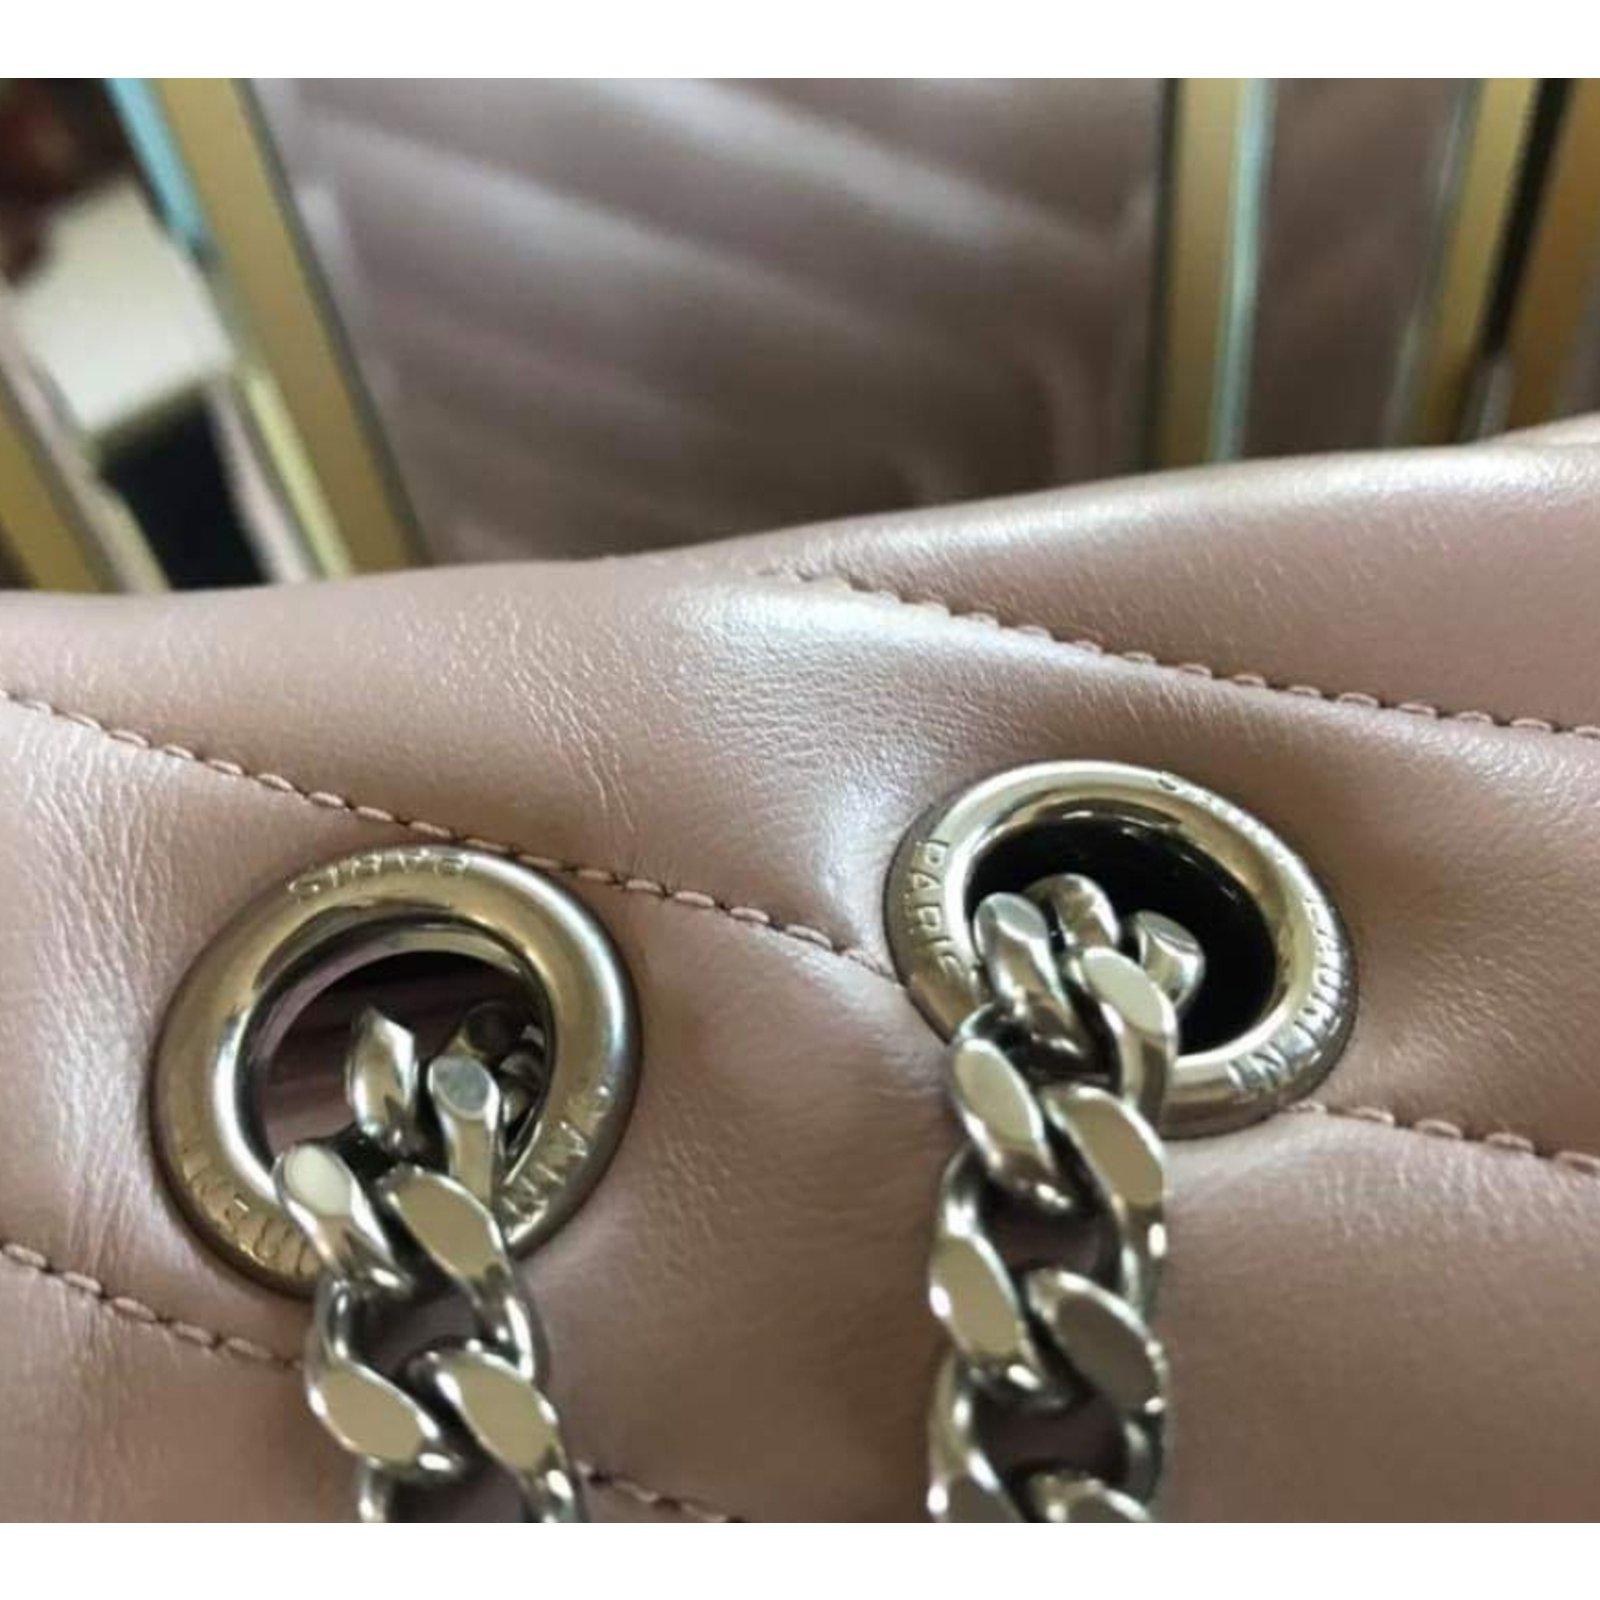 3fdc1f0ffc4 Saint Laurent Lou lou medium size Handbags Leather Pink ref.93795 - Joli  Closet